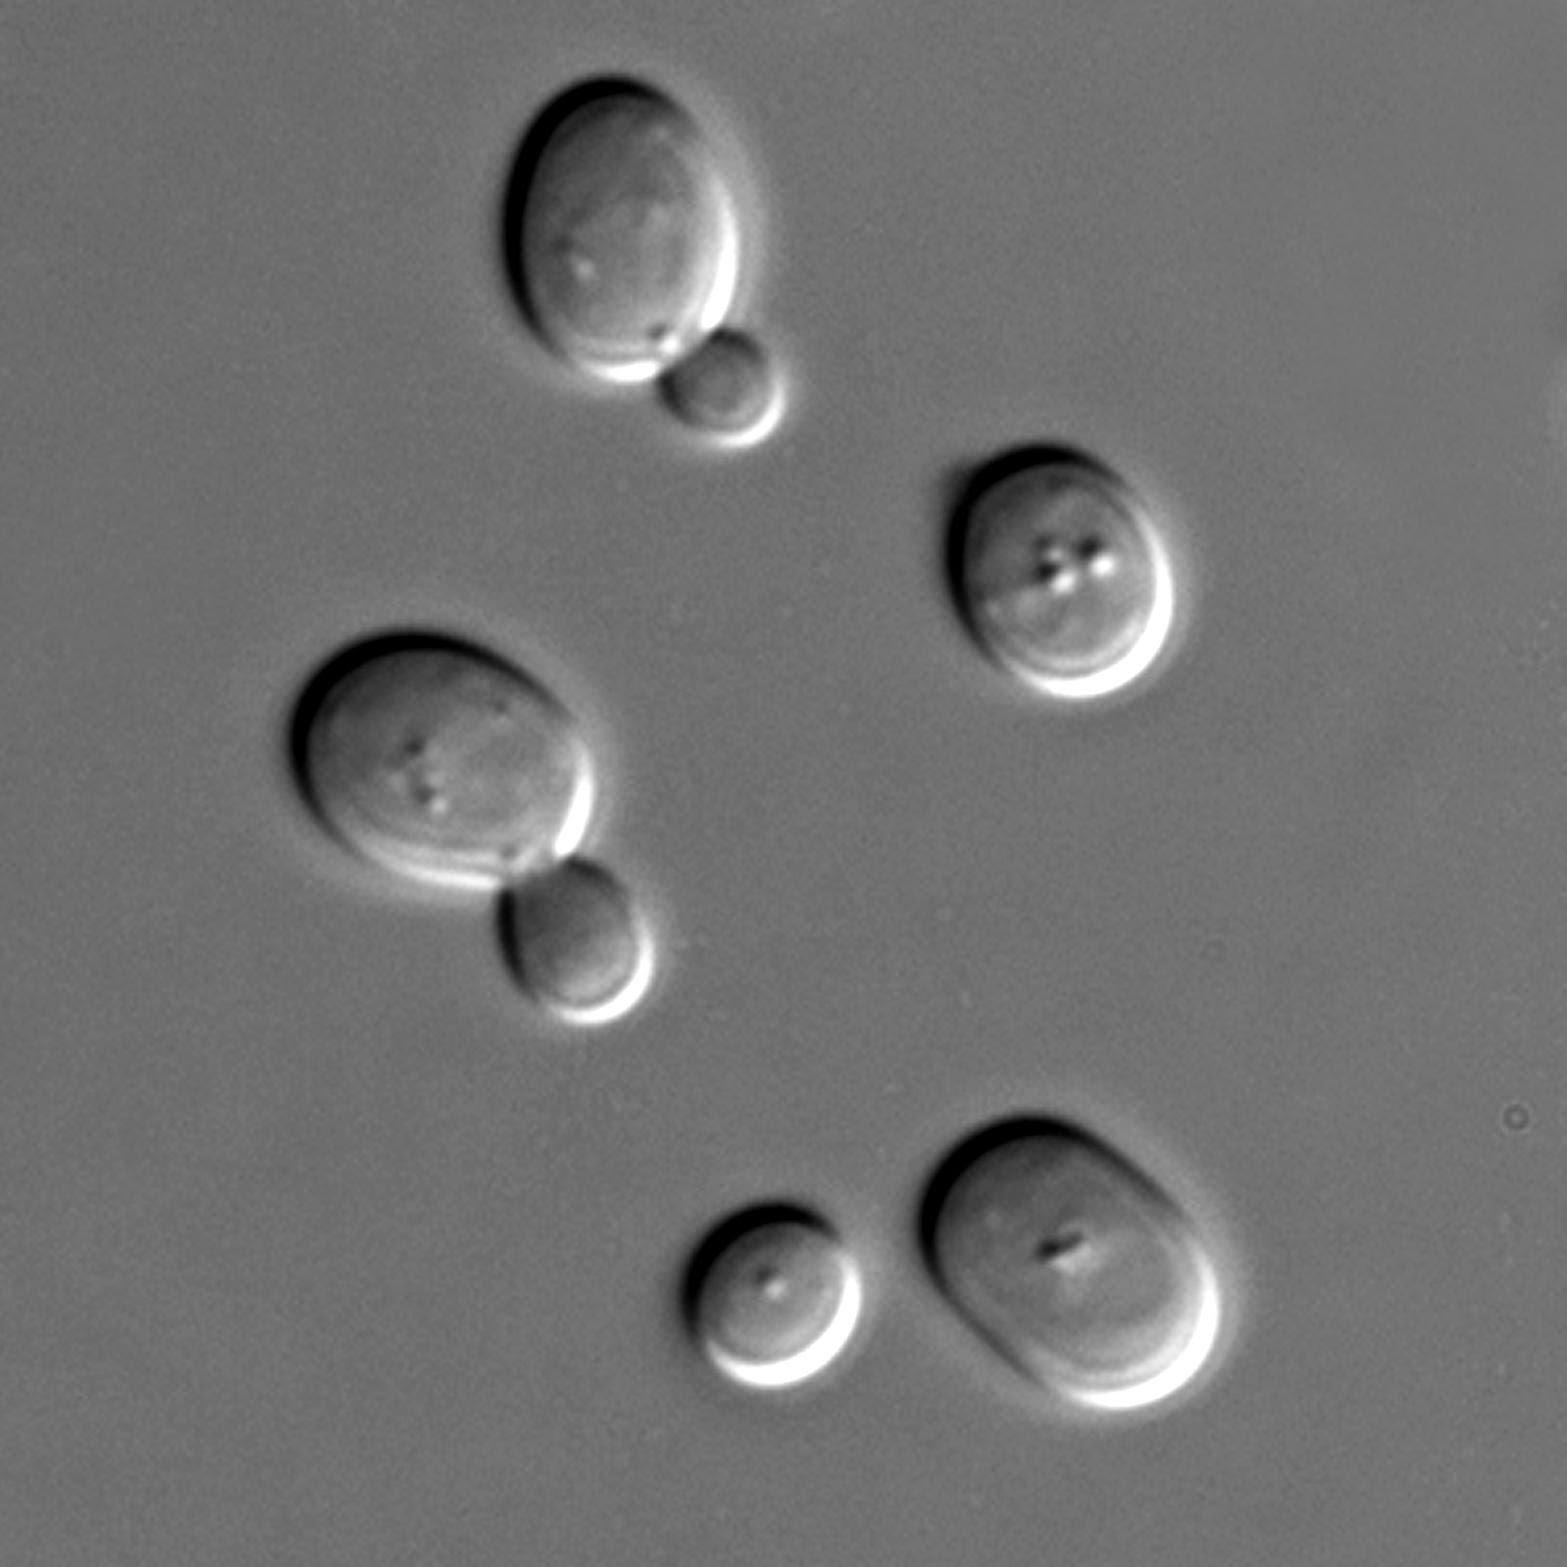 Saccharomyces sp